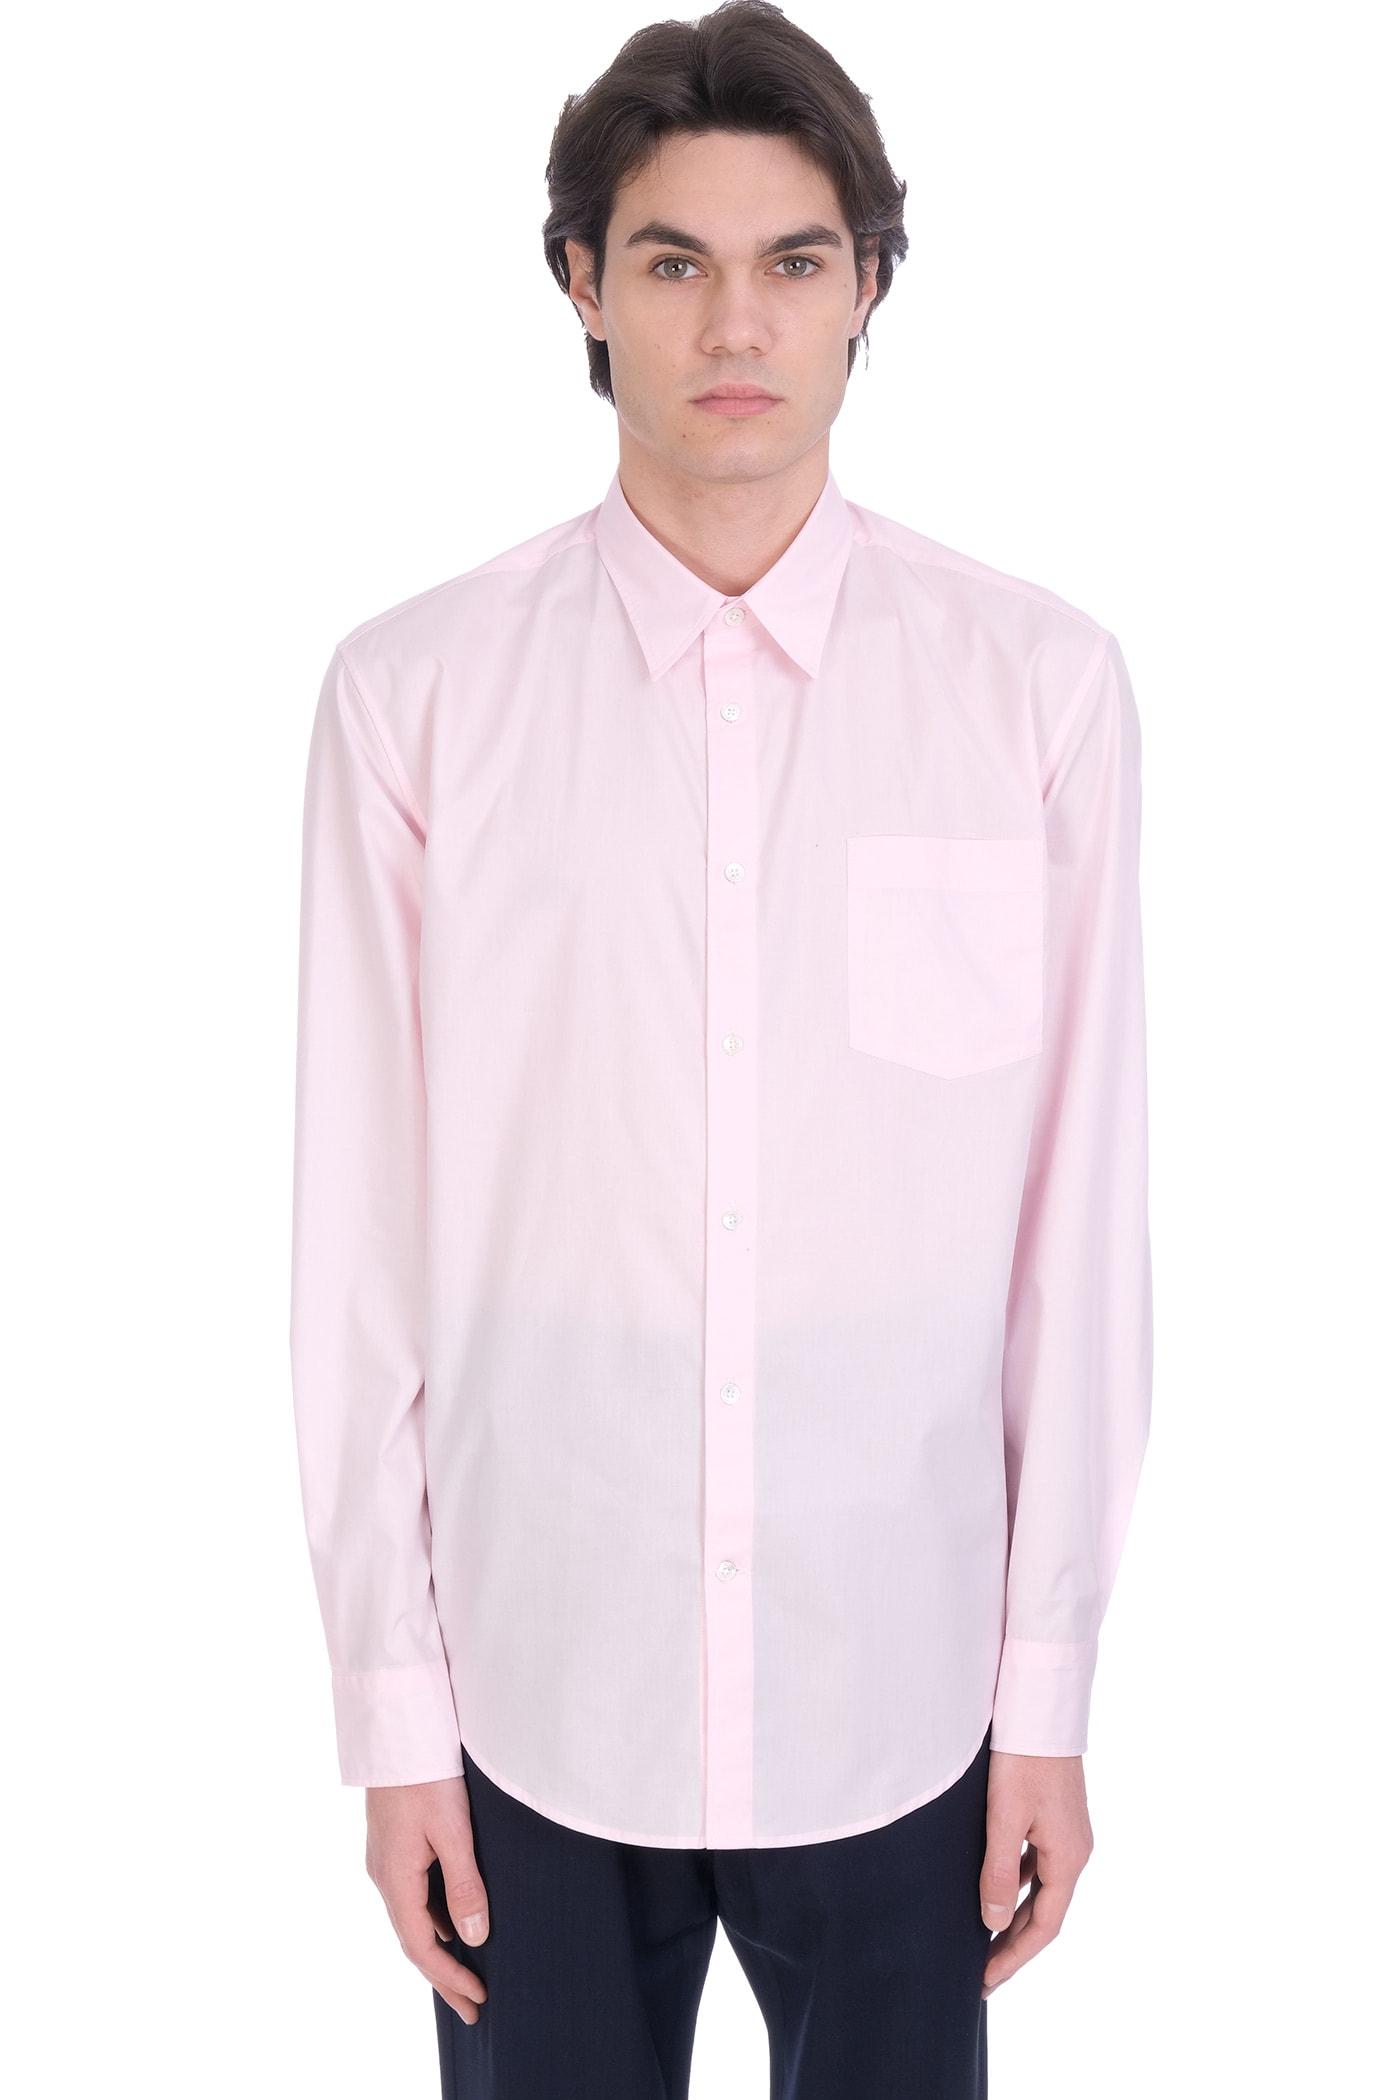 Shirt In Rose-pink Cotton